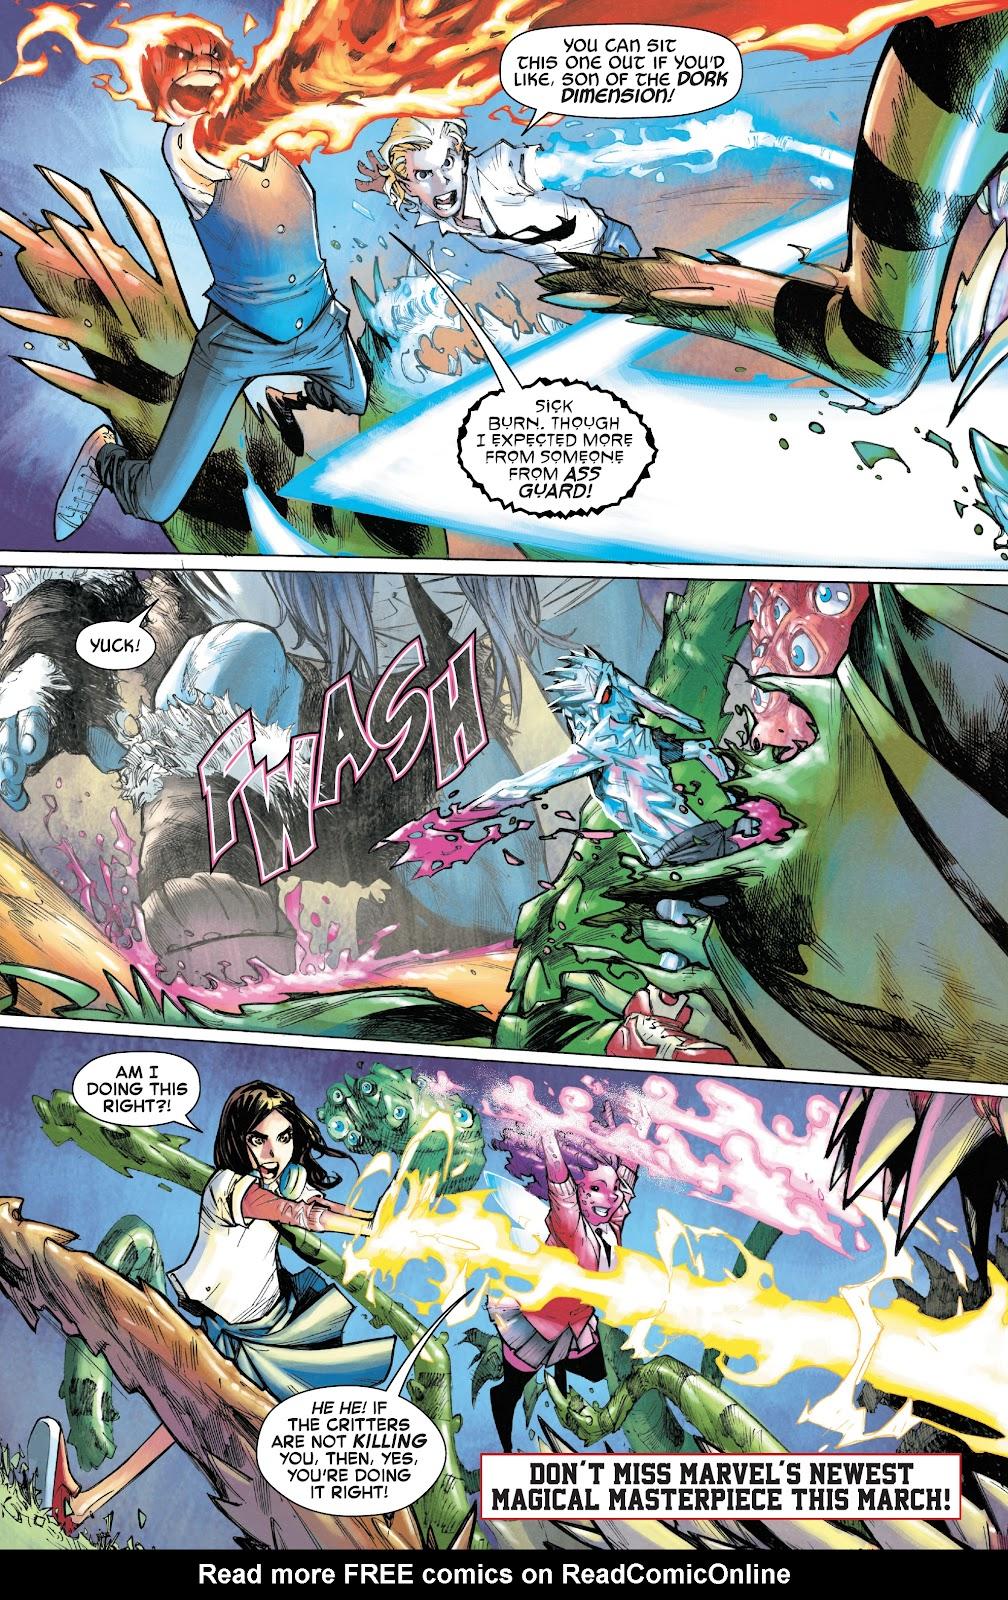 Read online Dr. Strange comic -  Issue #2 - 30